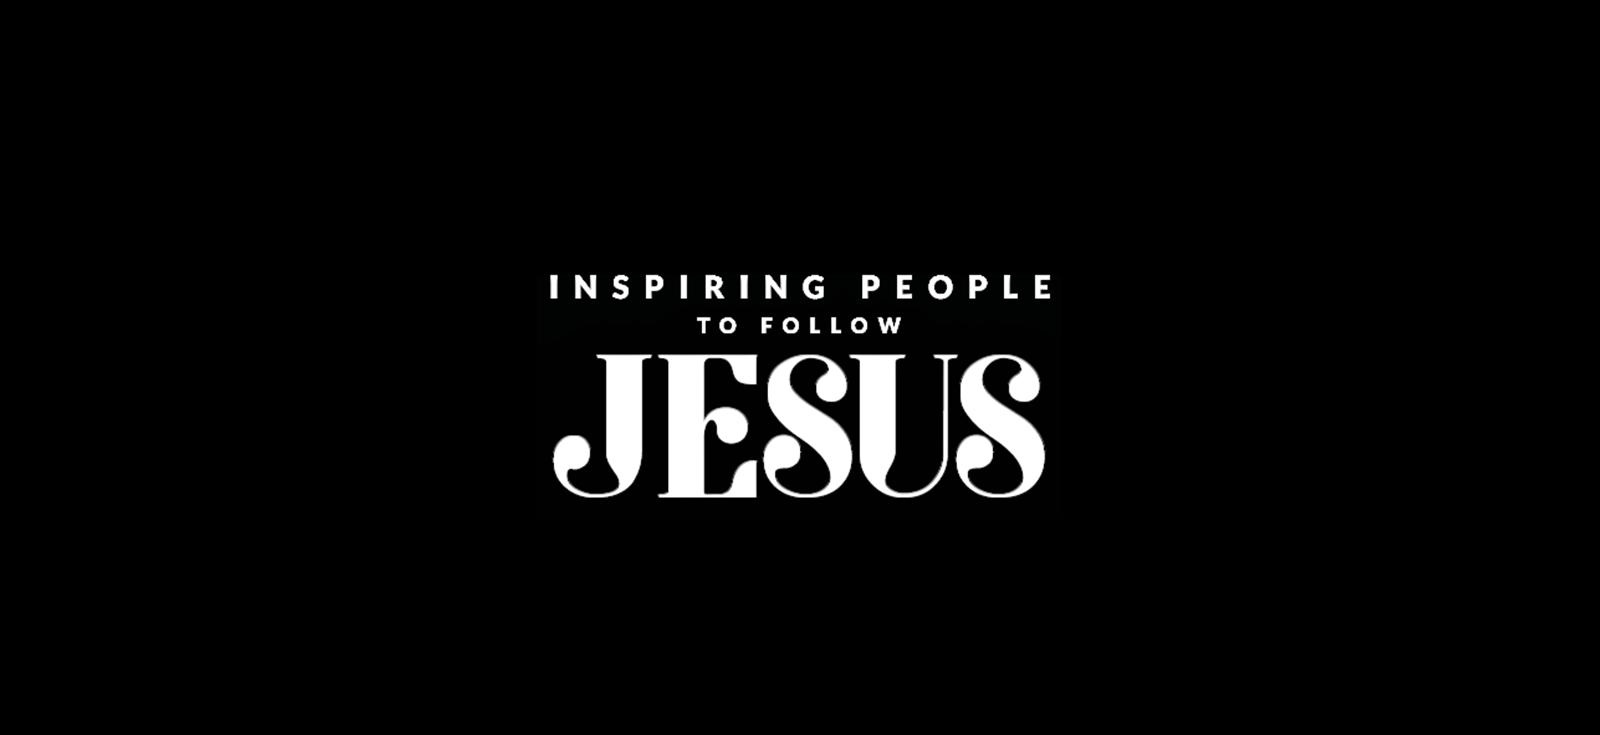 Inspiring people to follow Jesus